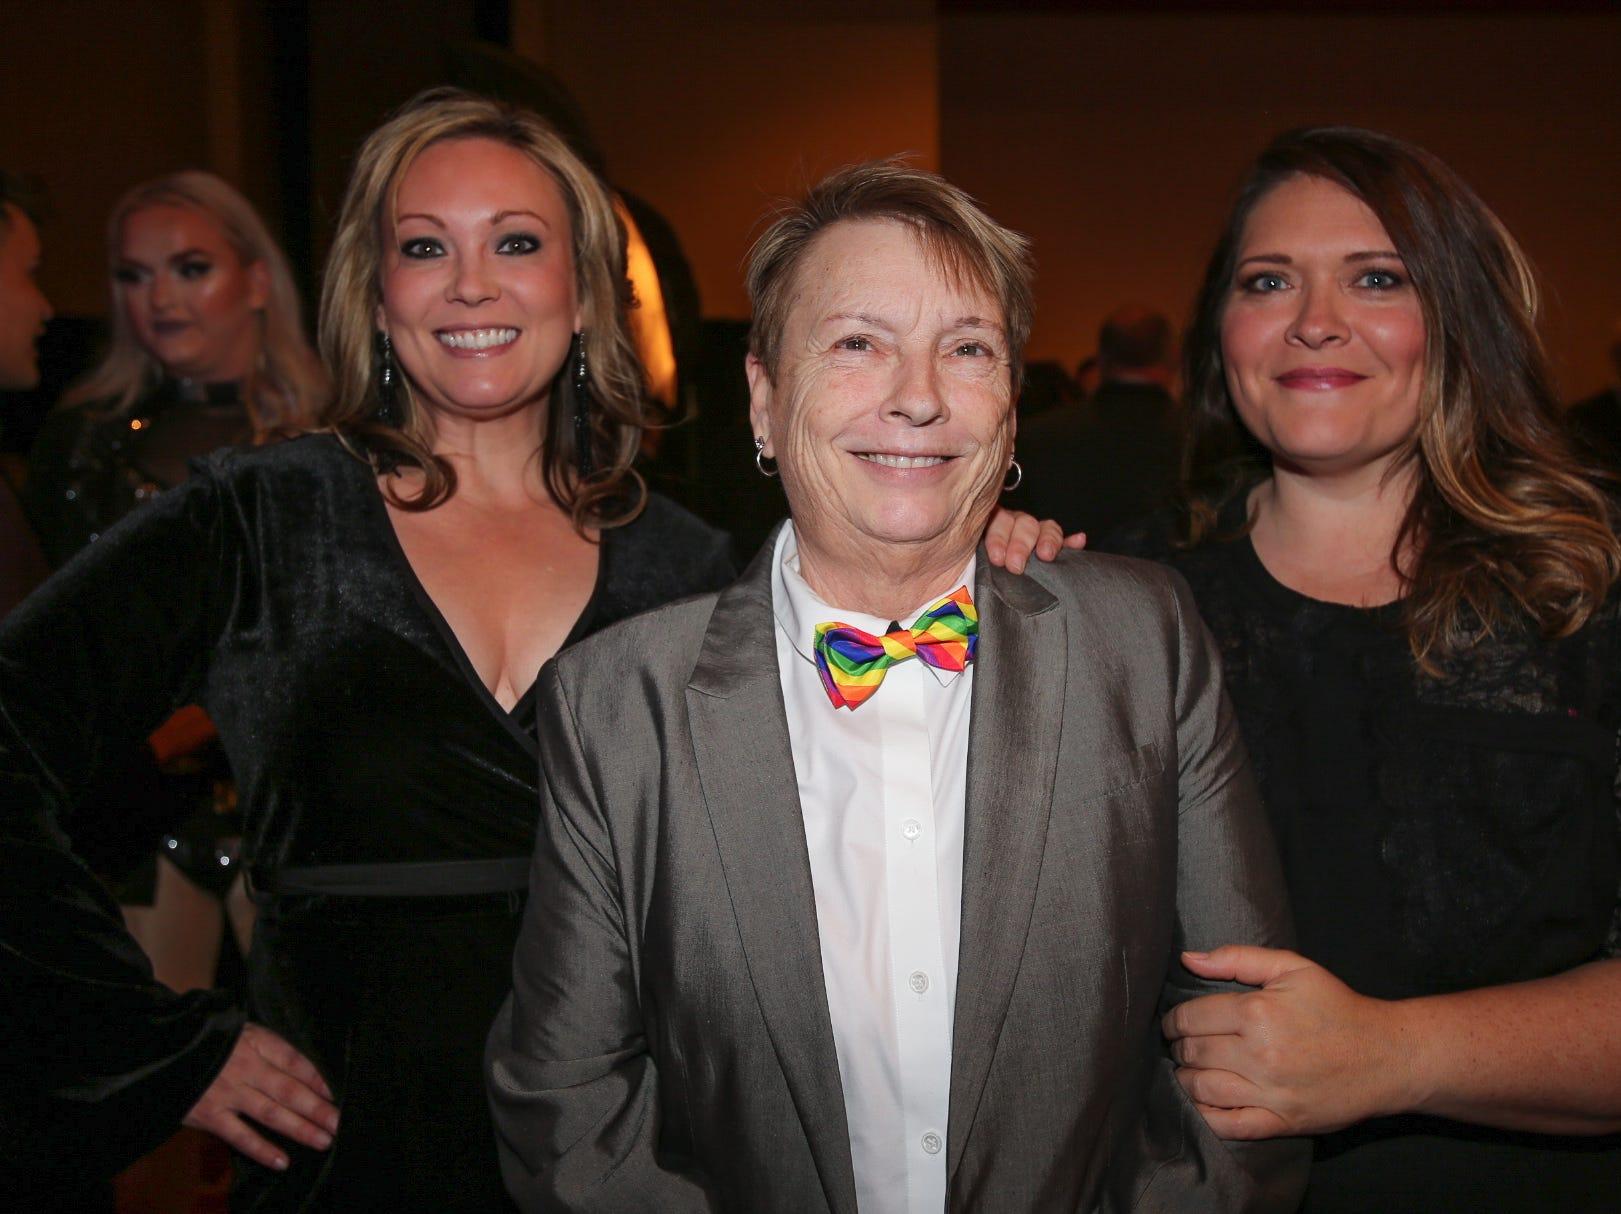 Keri McKee, Vickie Robinson, and Addy McCord